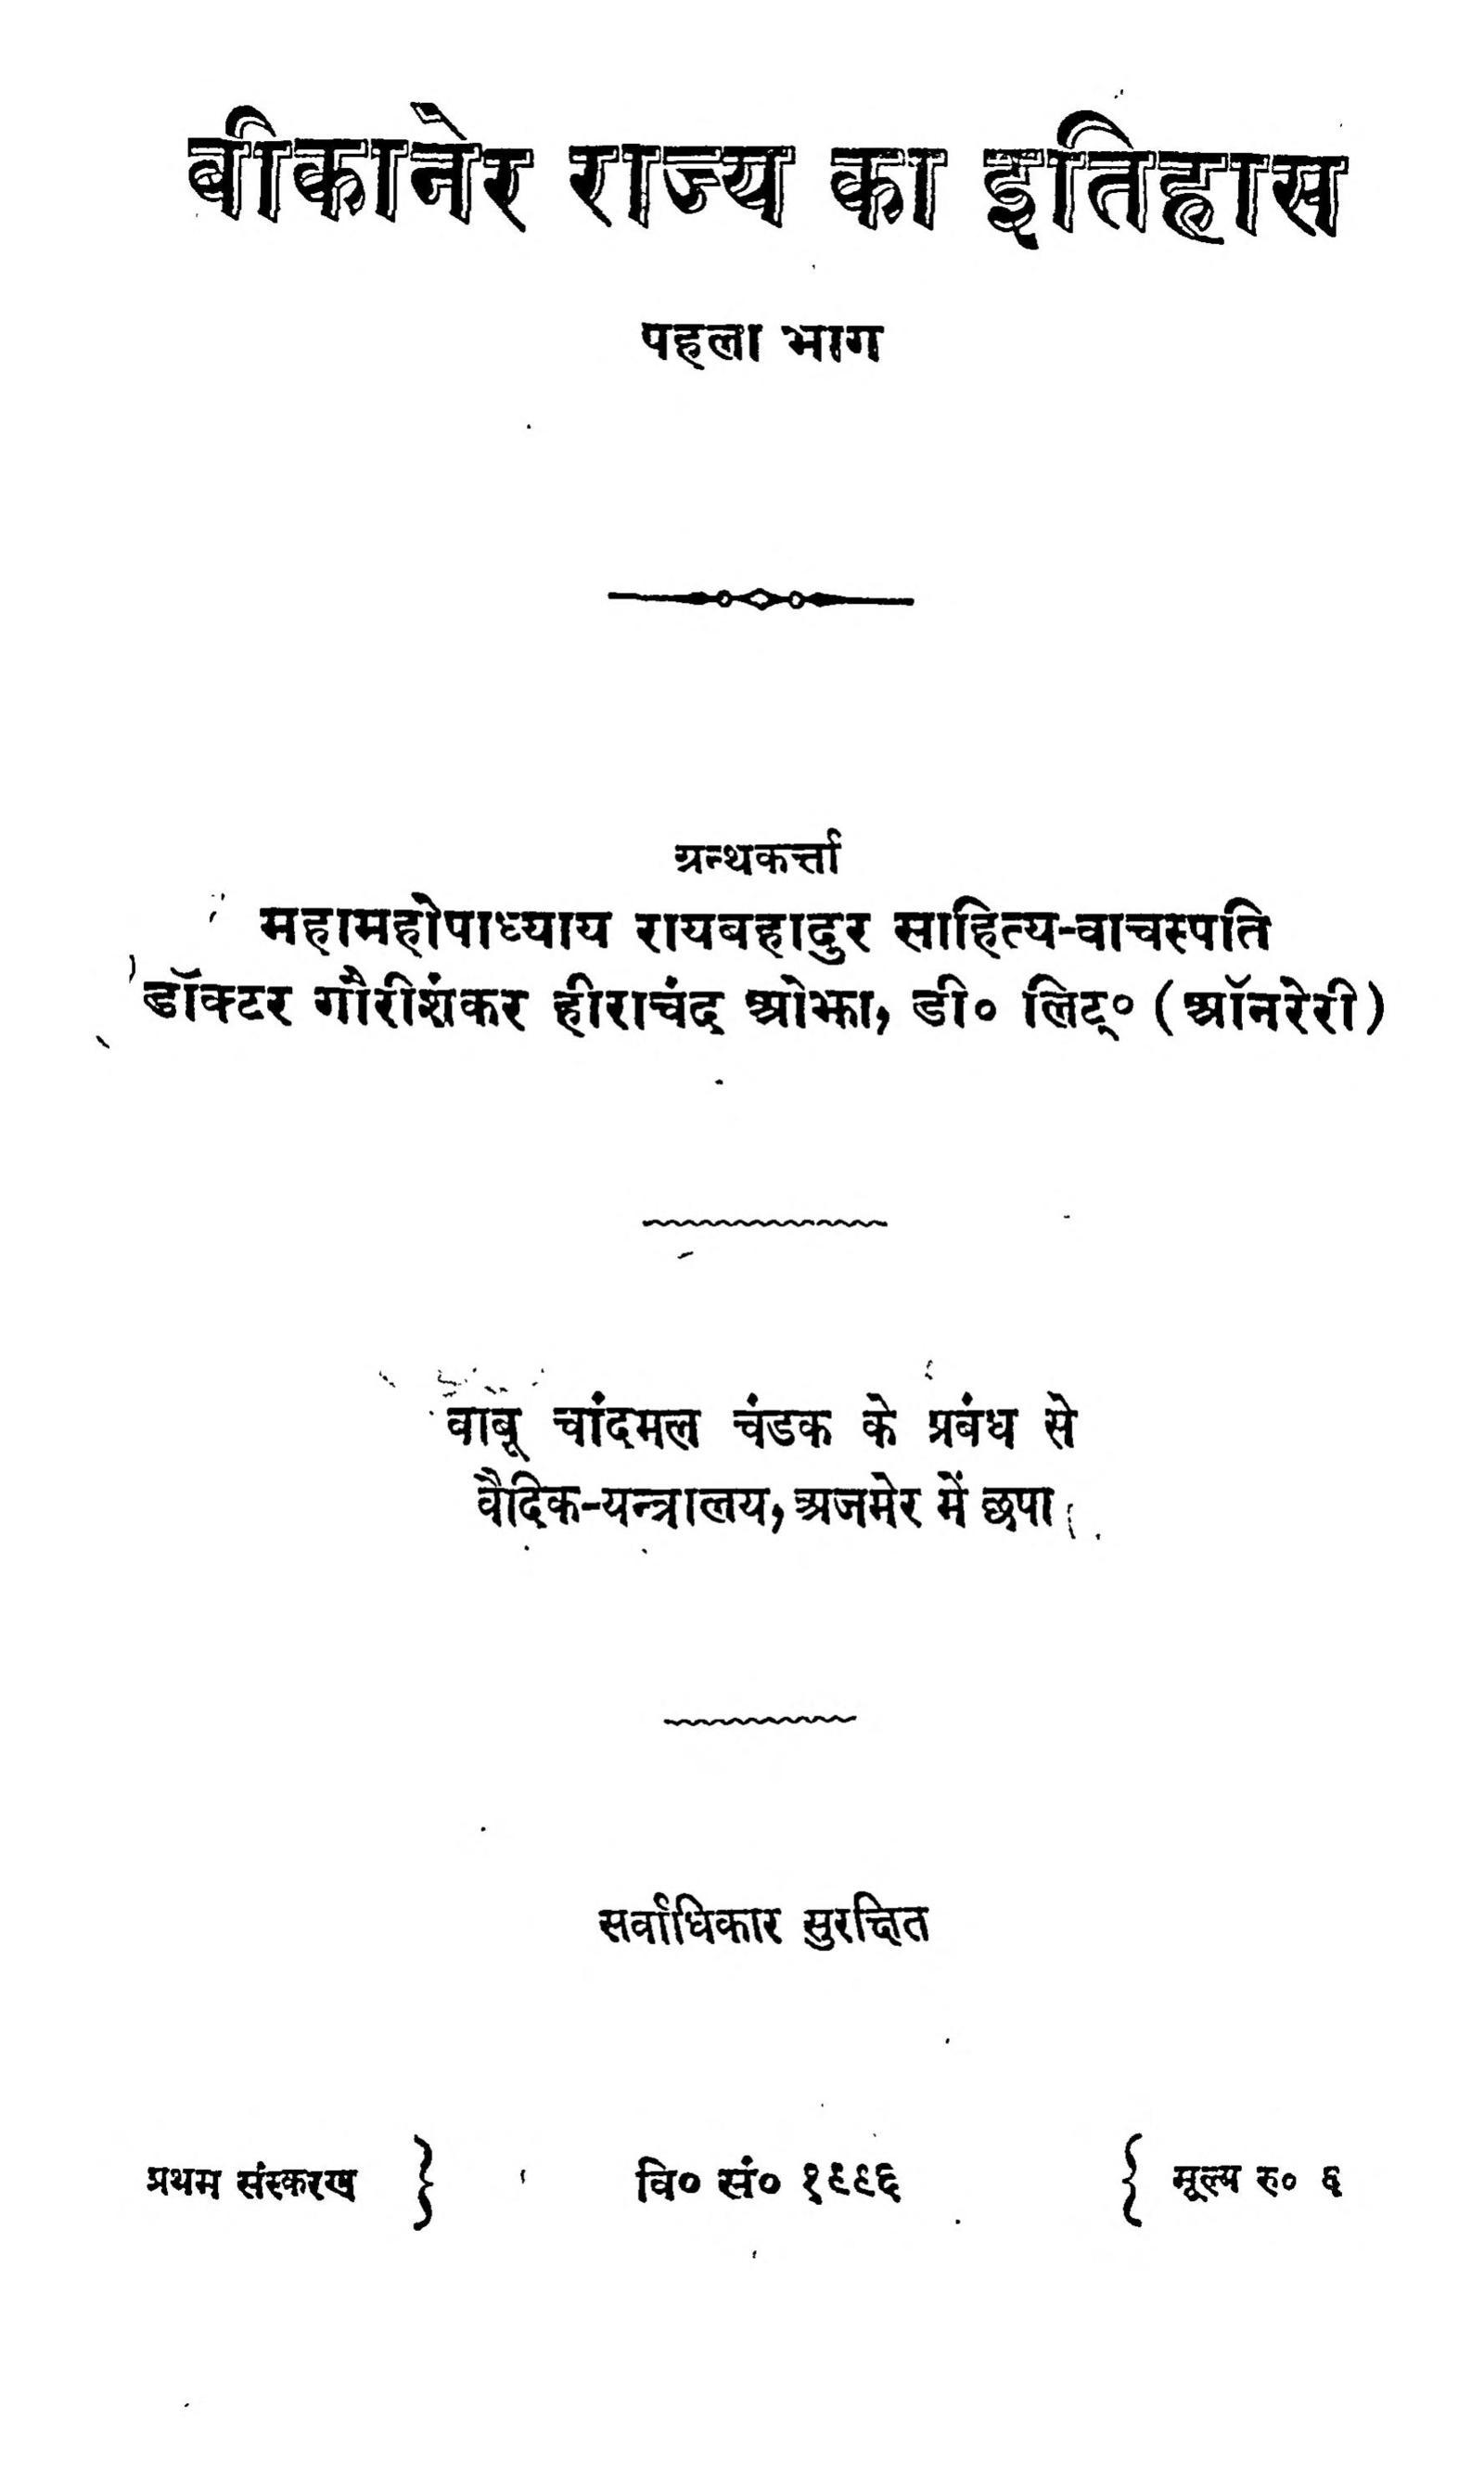 Bikaner Rajya KaKa Itihas  by गौरीशंकर हीराचंद ओझा - Gaurishankar Heerachand Ojha